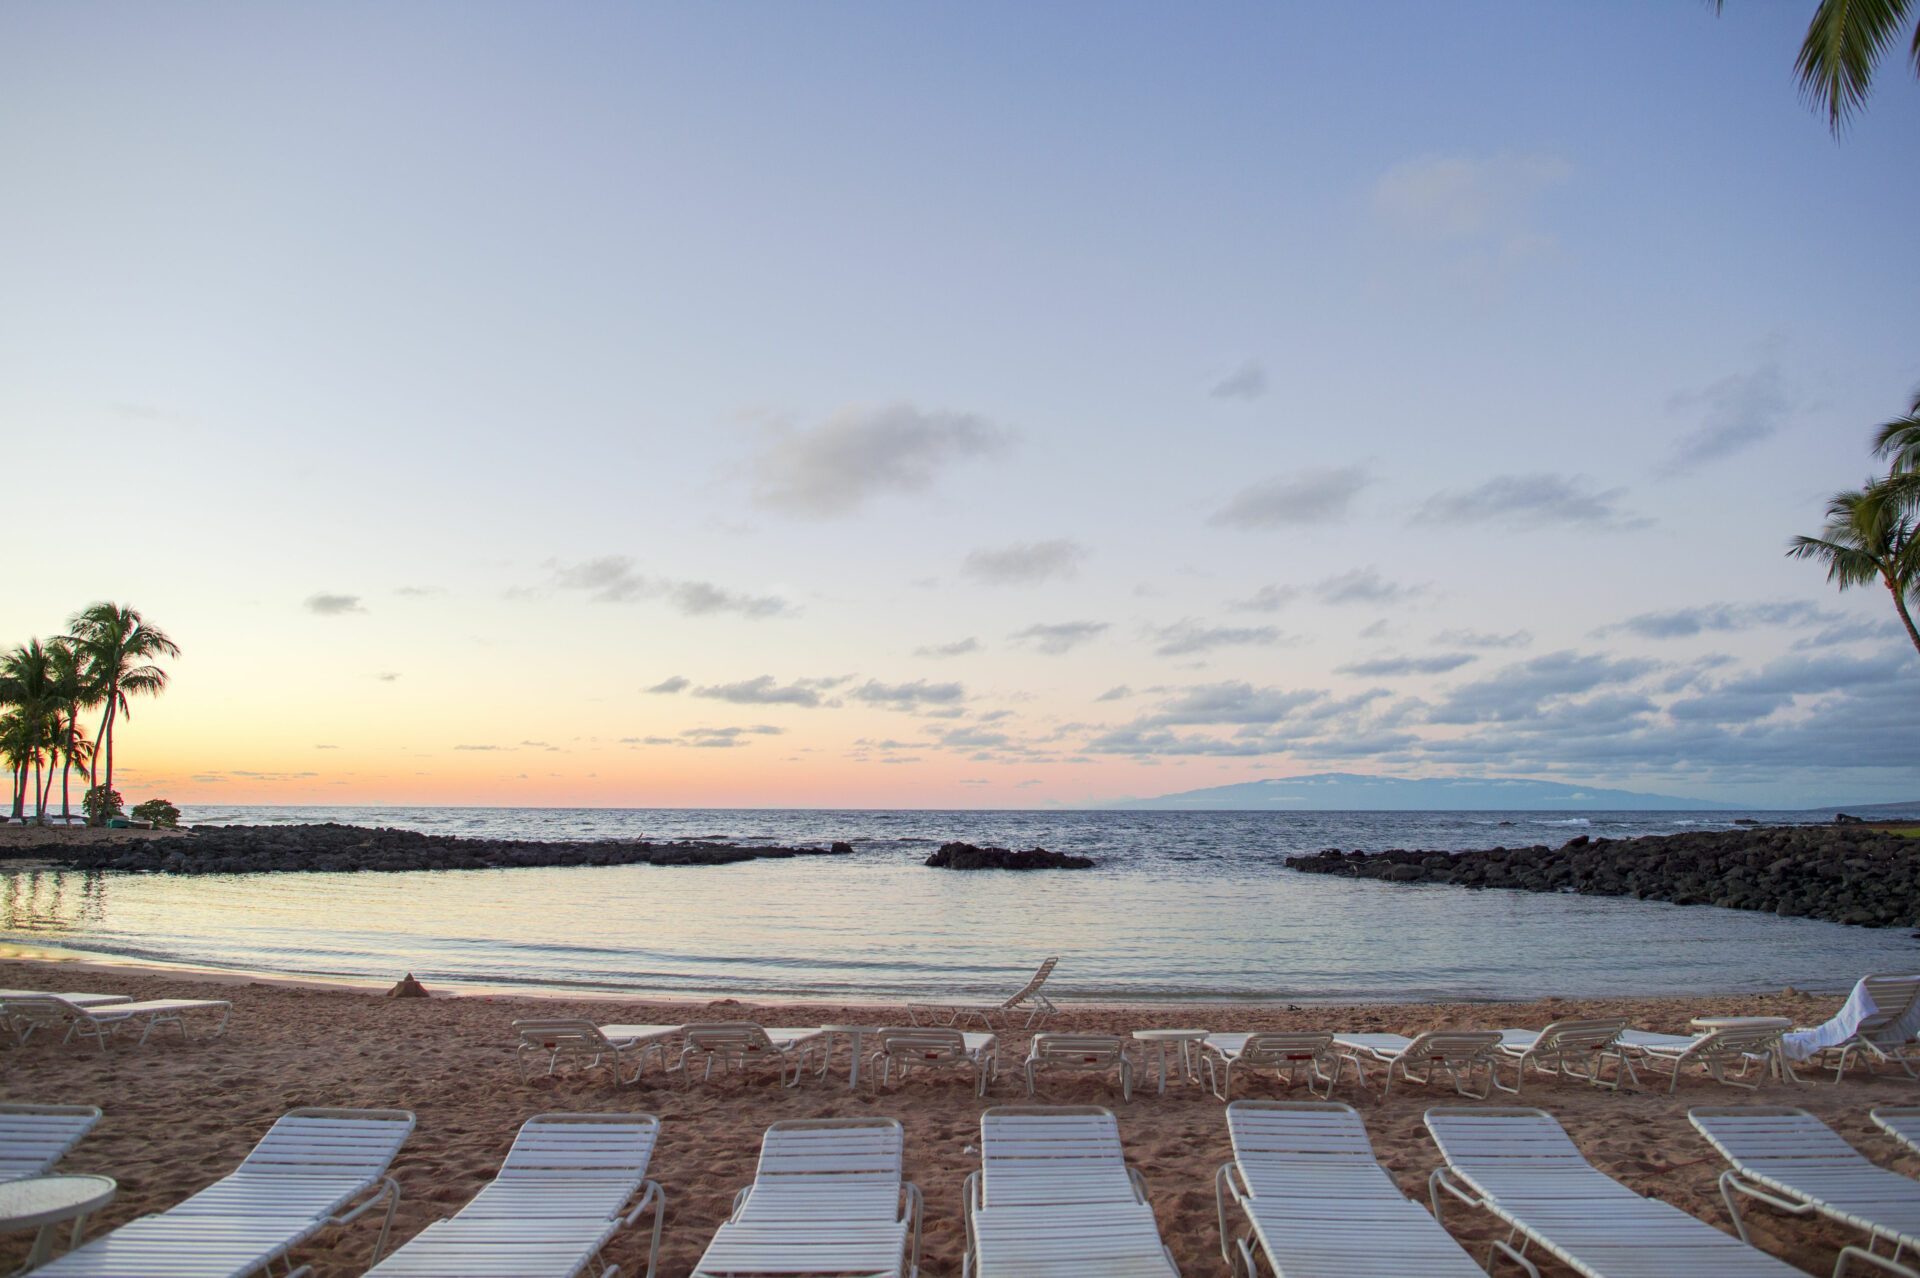 34981559 - hawaian beach at sunset time